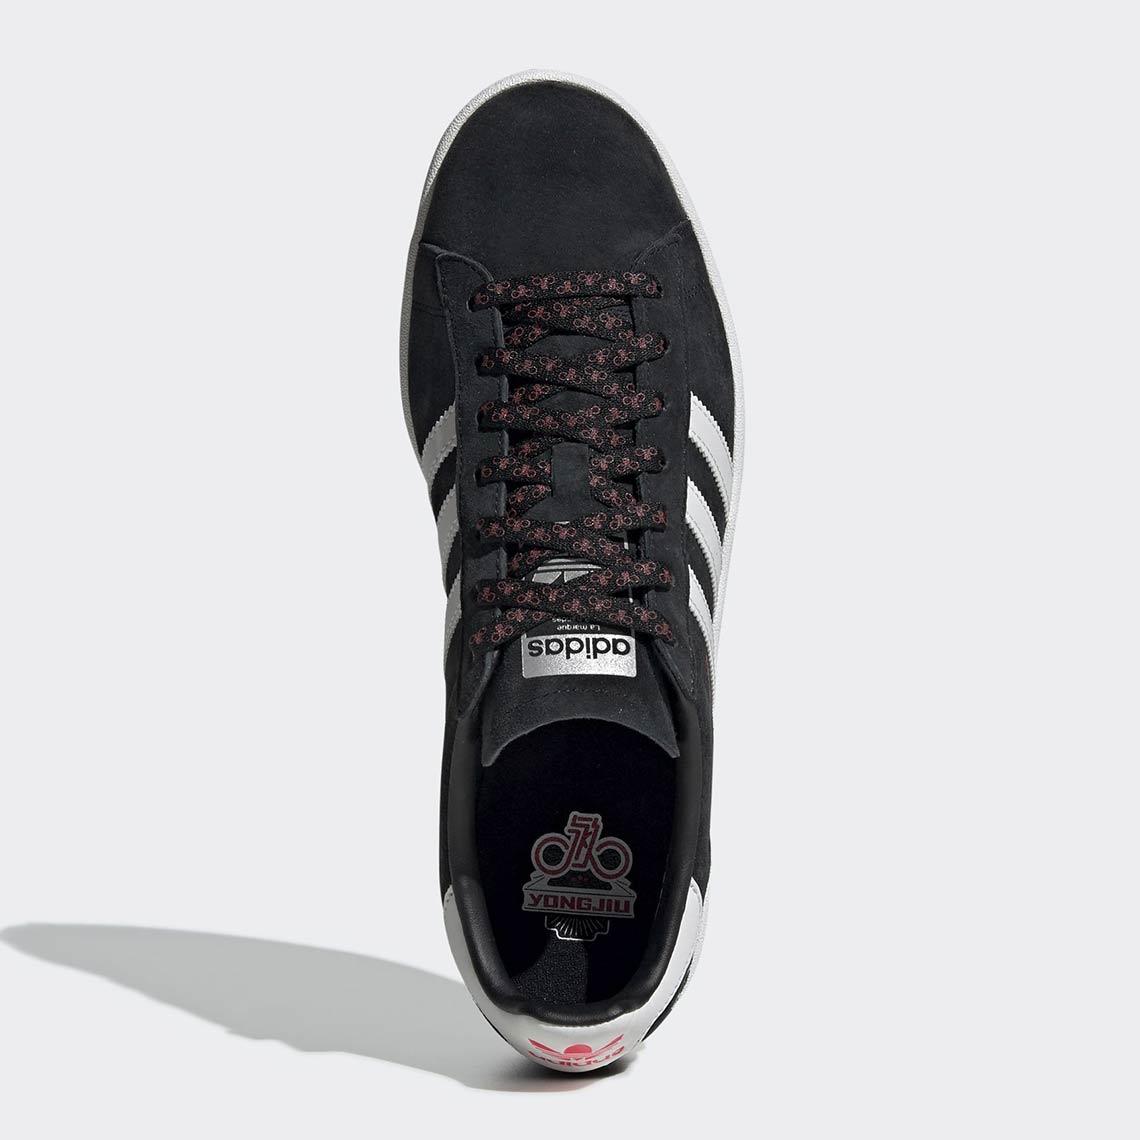 adidas Originals 即将联名「上海永久自行